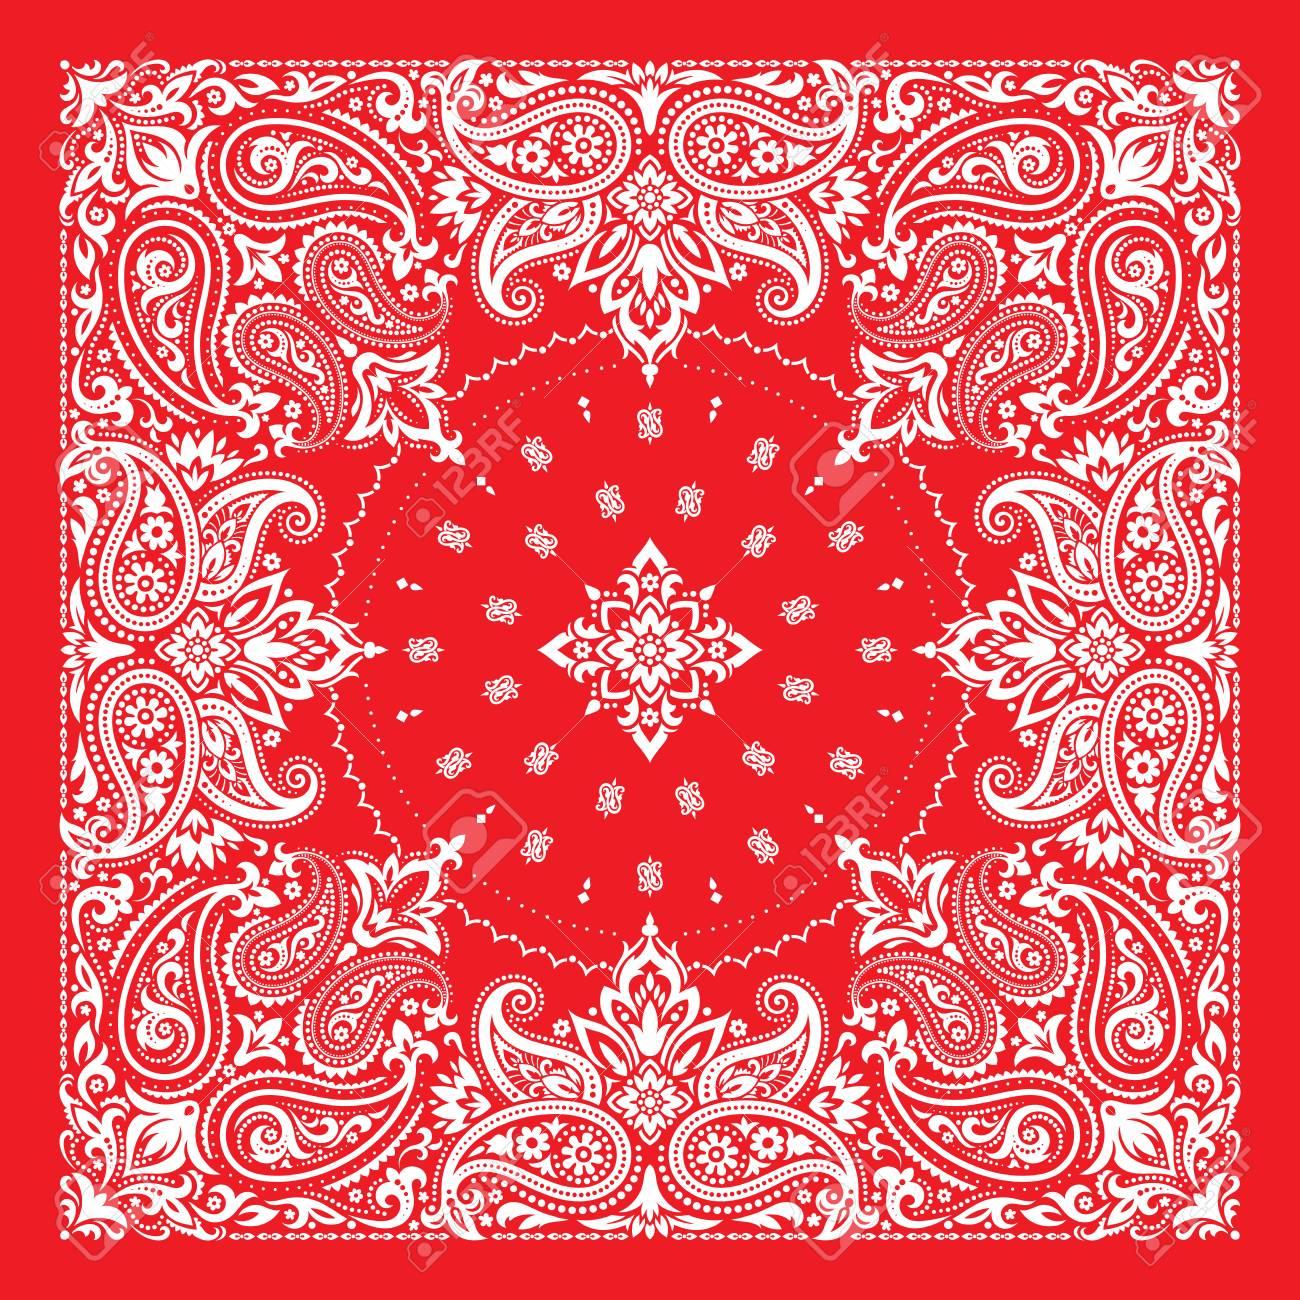 Bandana Print, silk neck scarf or kerchief square pattern design - 88986120